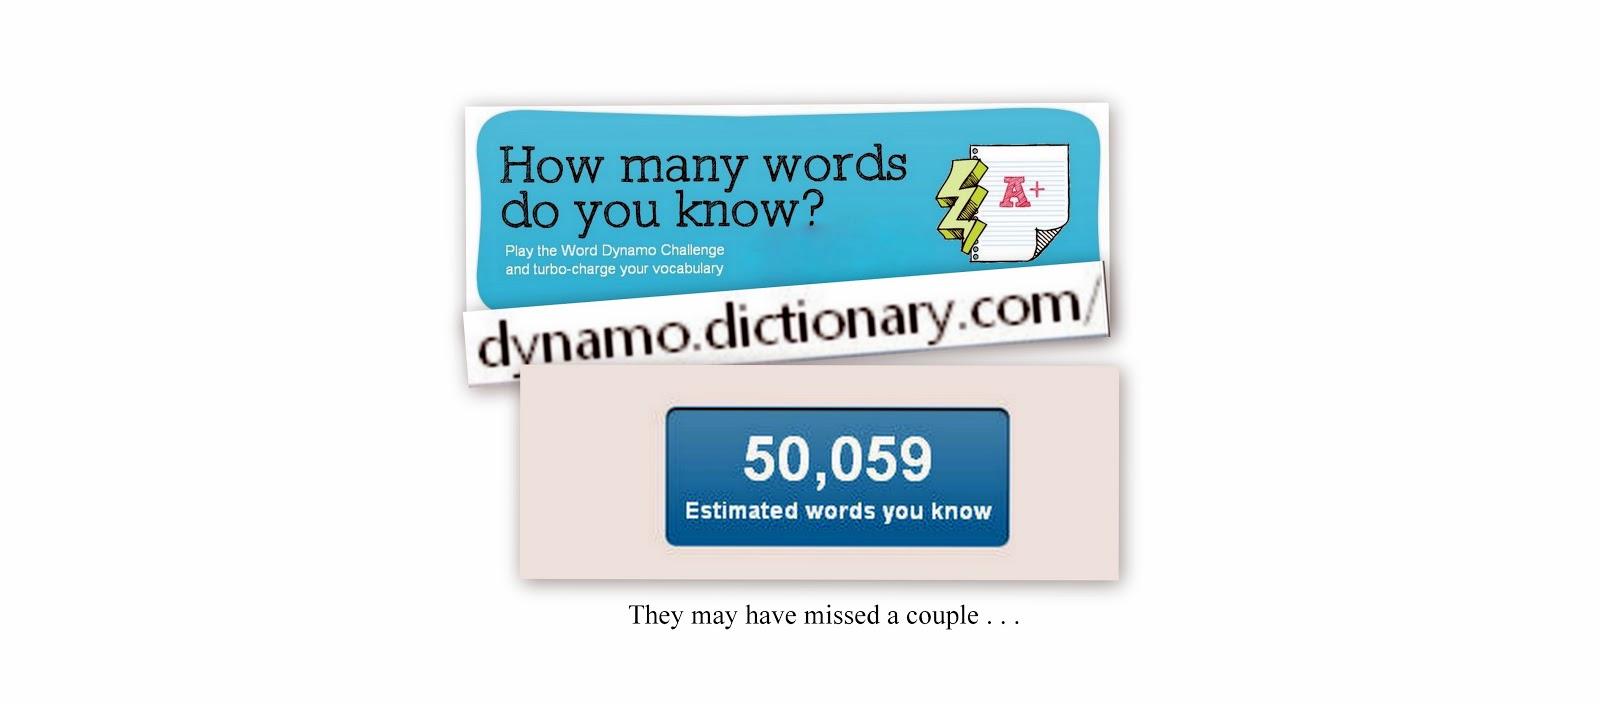 ipad dictionary no definition found